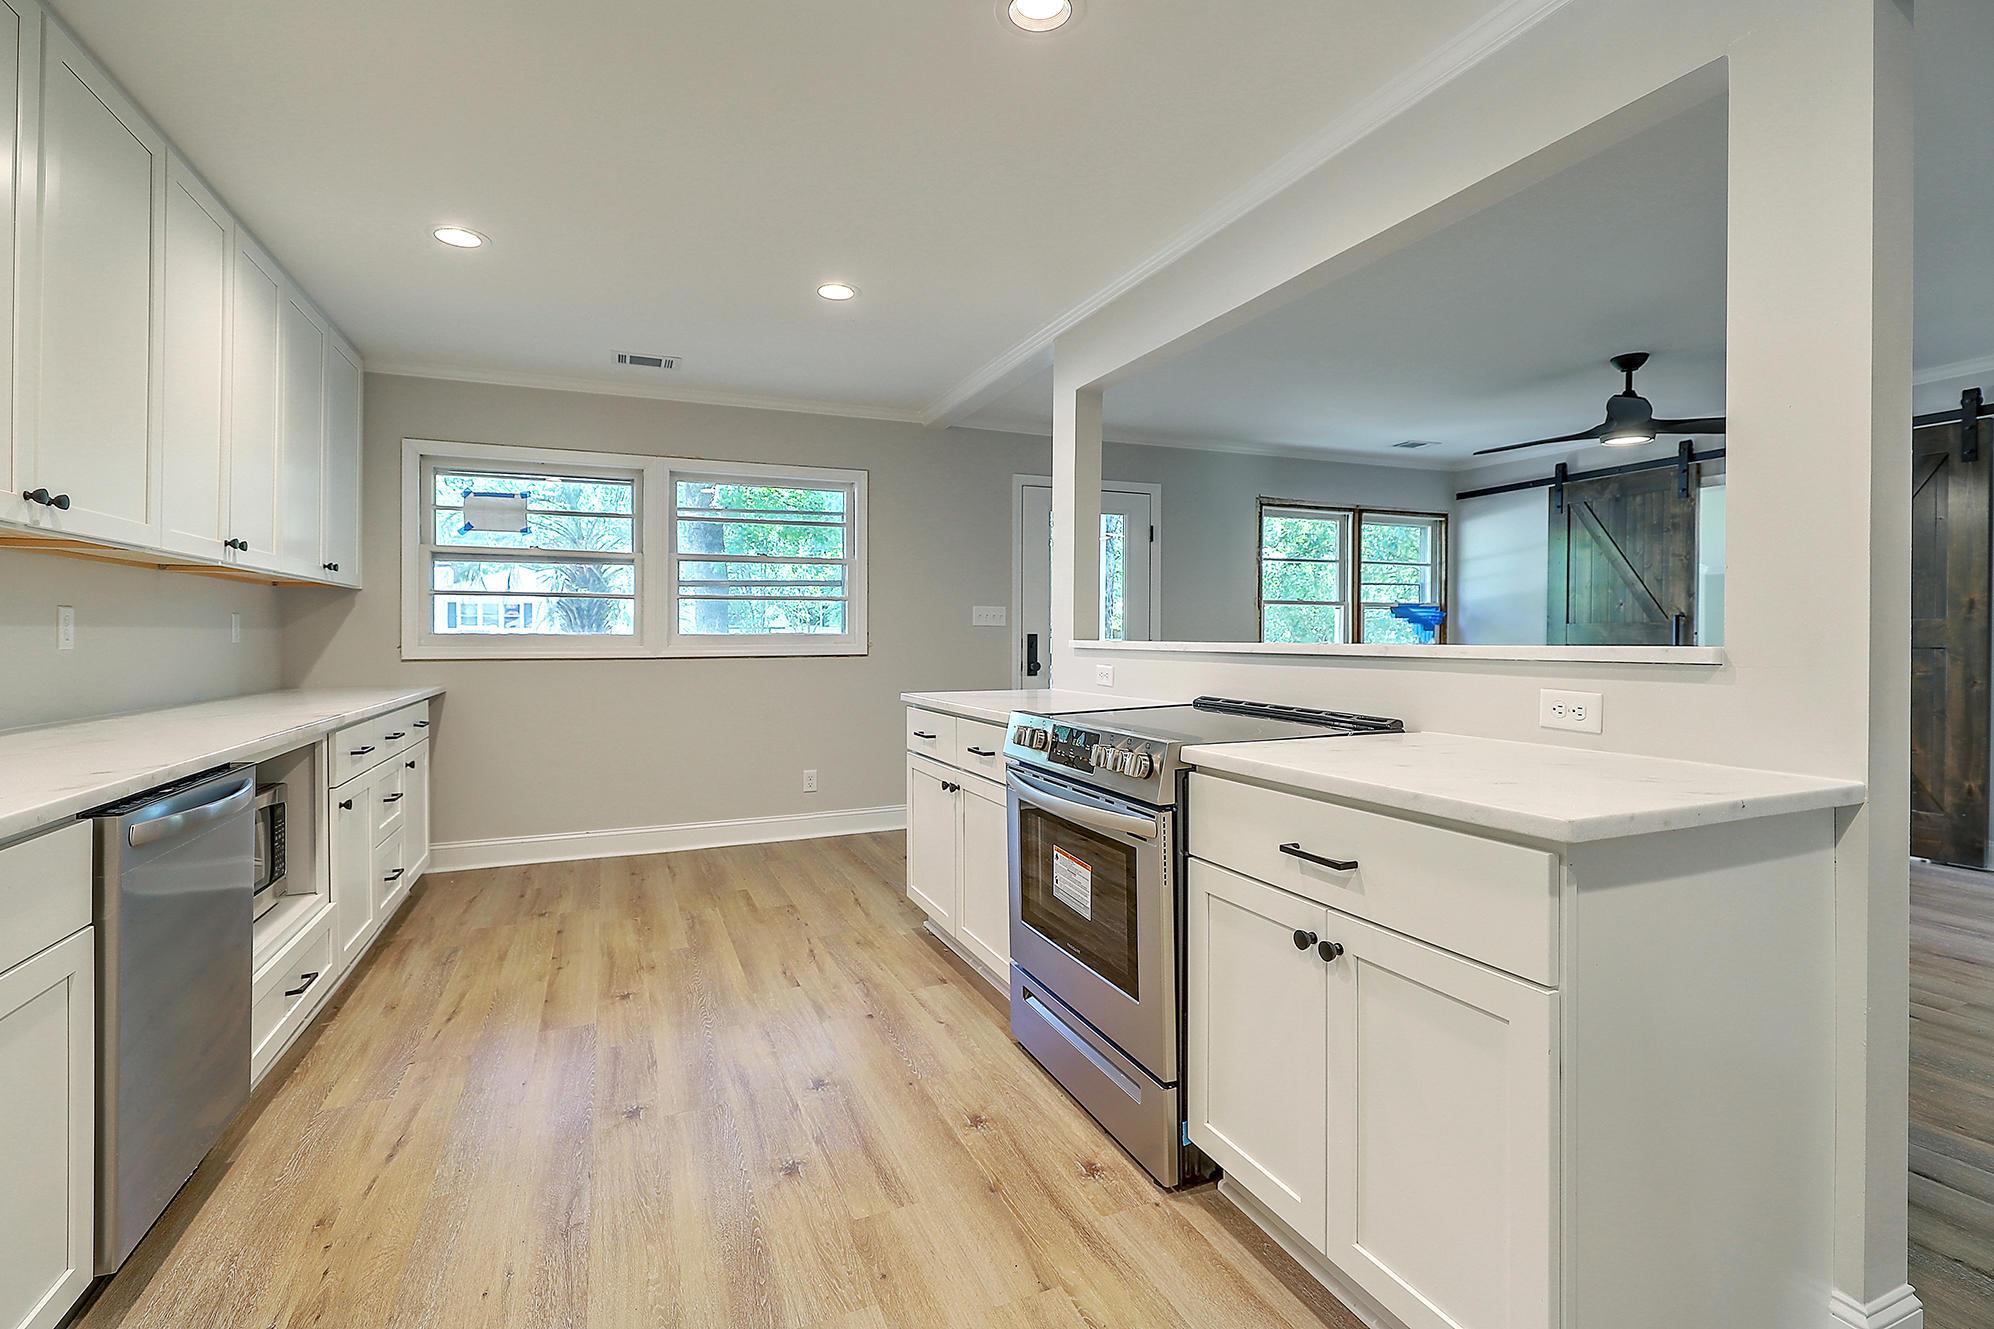 Lawton Bluff Homes For Sale - 847 Quail, Charleston, SC - 0